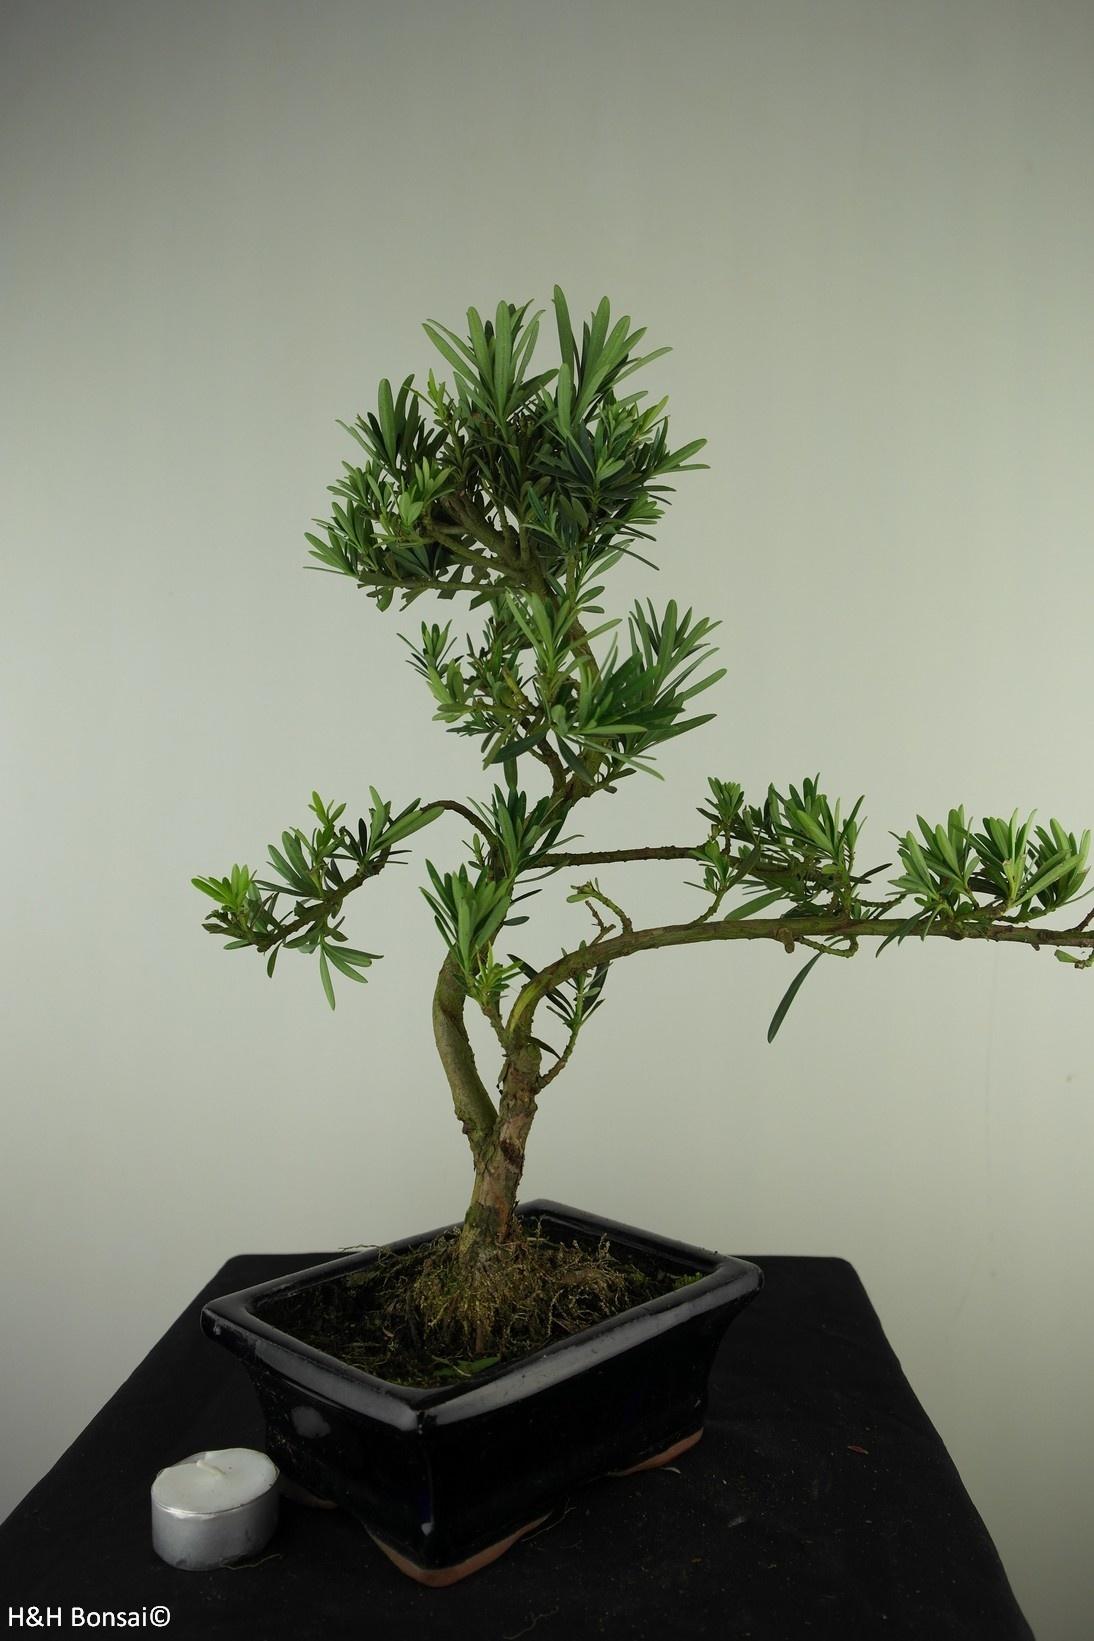 Bonsai Buddhist Pine, Podocarpus, no. 7717